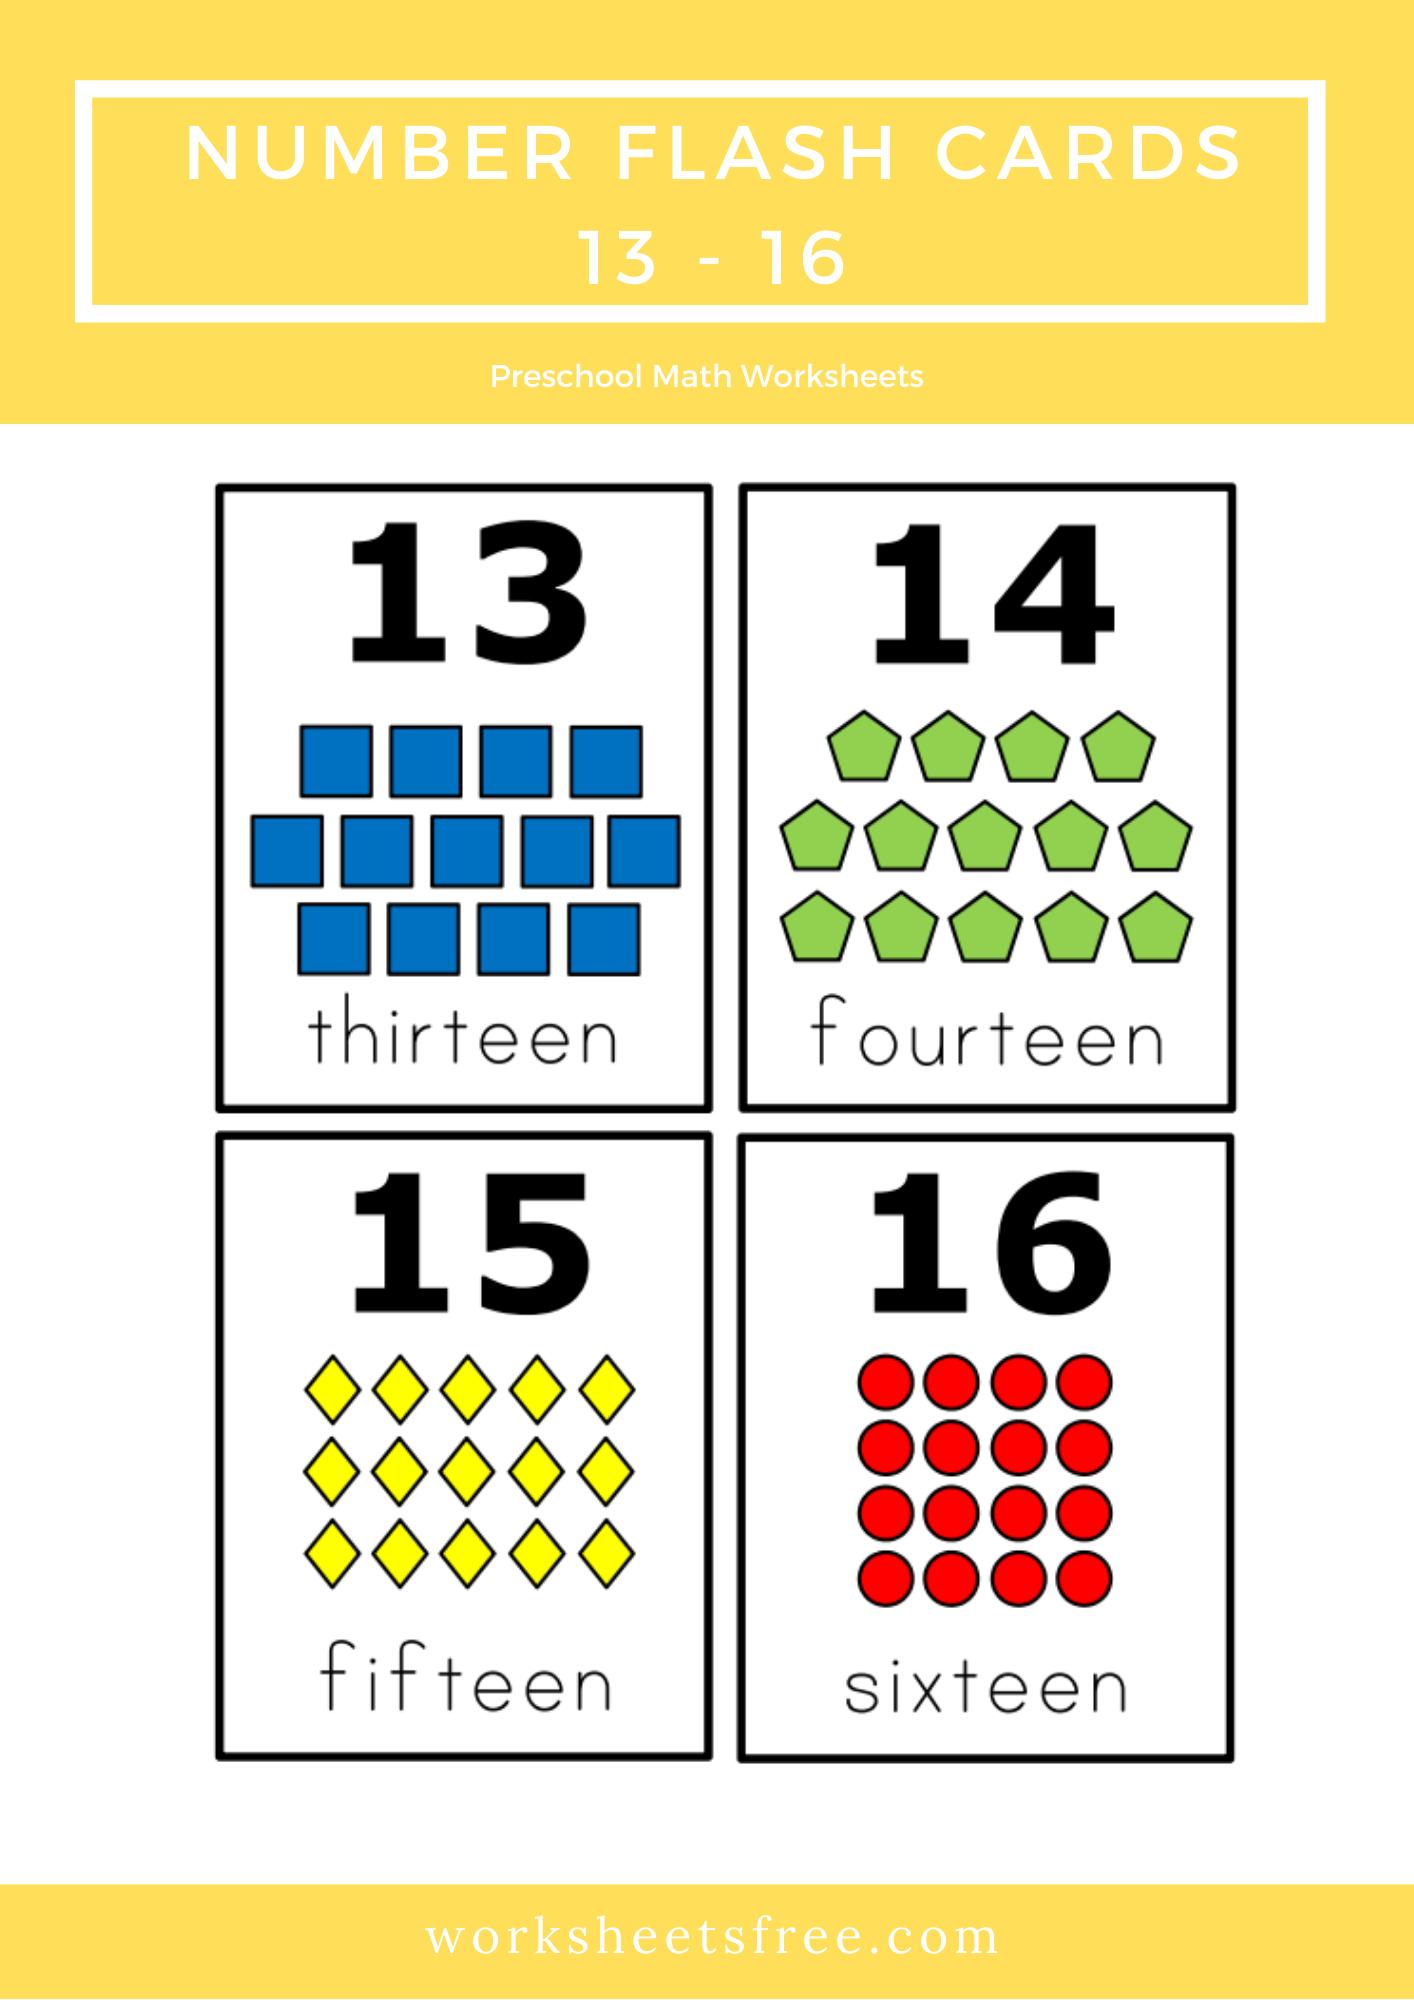 Number Flash Cards 13 16 Top 10 Preschool Math Kids Activities Worksheets Kids Math Activities Math For Kids Preschool Math Worksheets